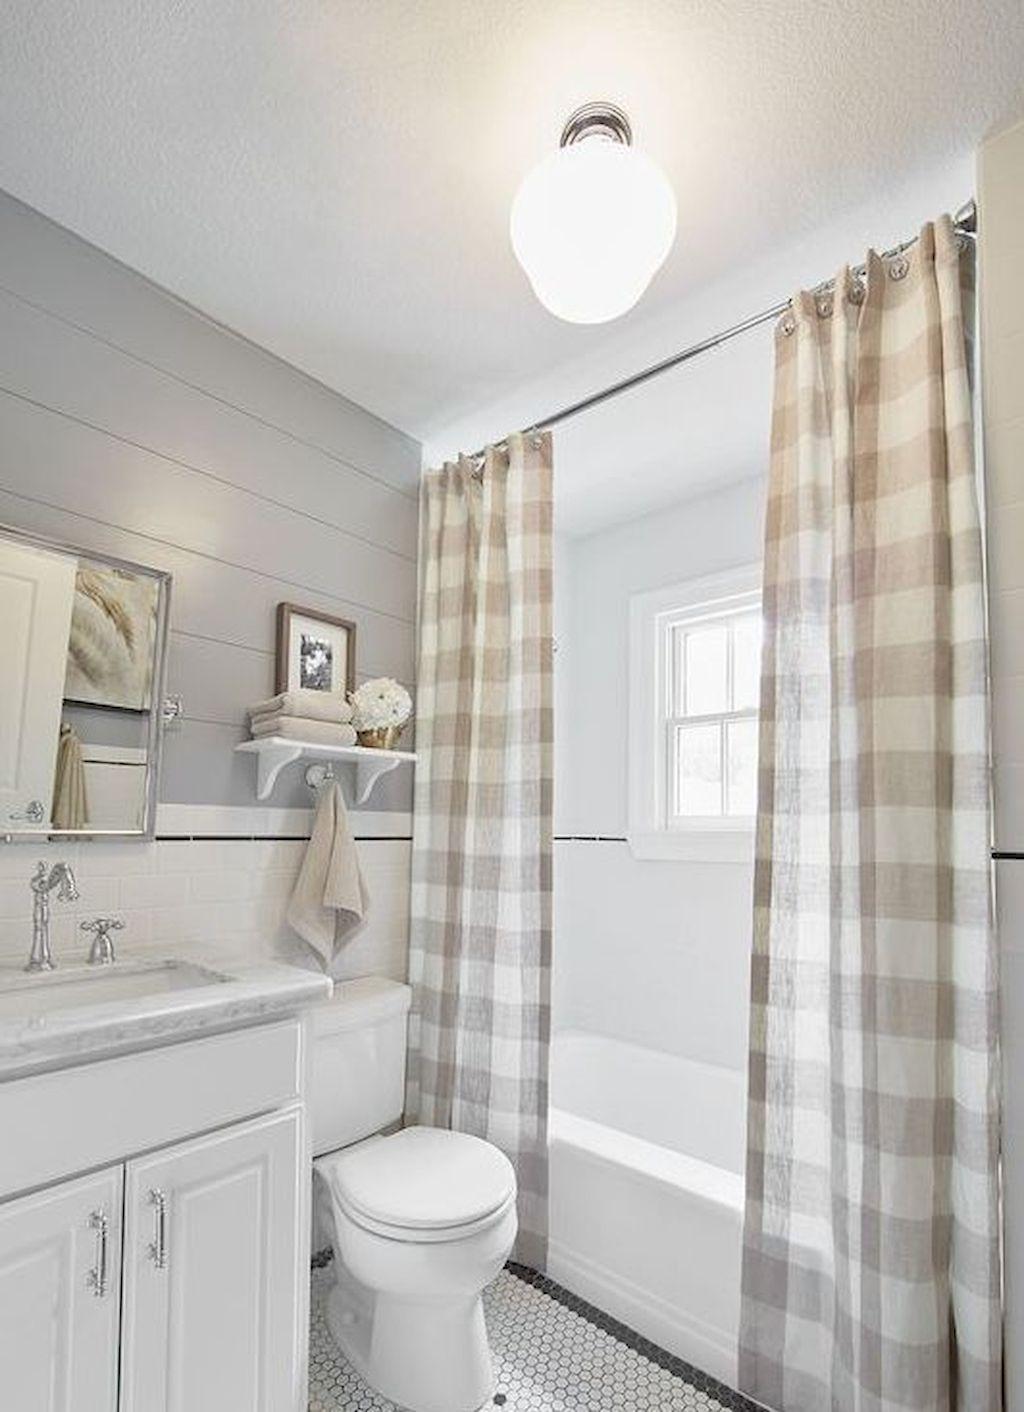 45 Farmhouse Rustic Bathroom Decor Ideas On A Budget  Rustic Prepossessing Bathroom Decor Ideas On A Budget Design Ideas